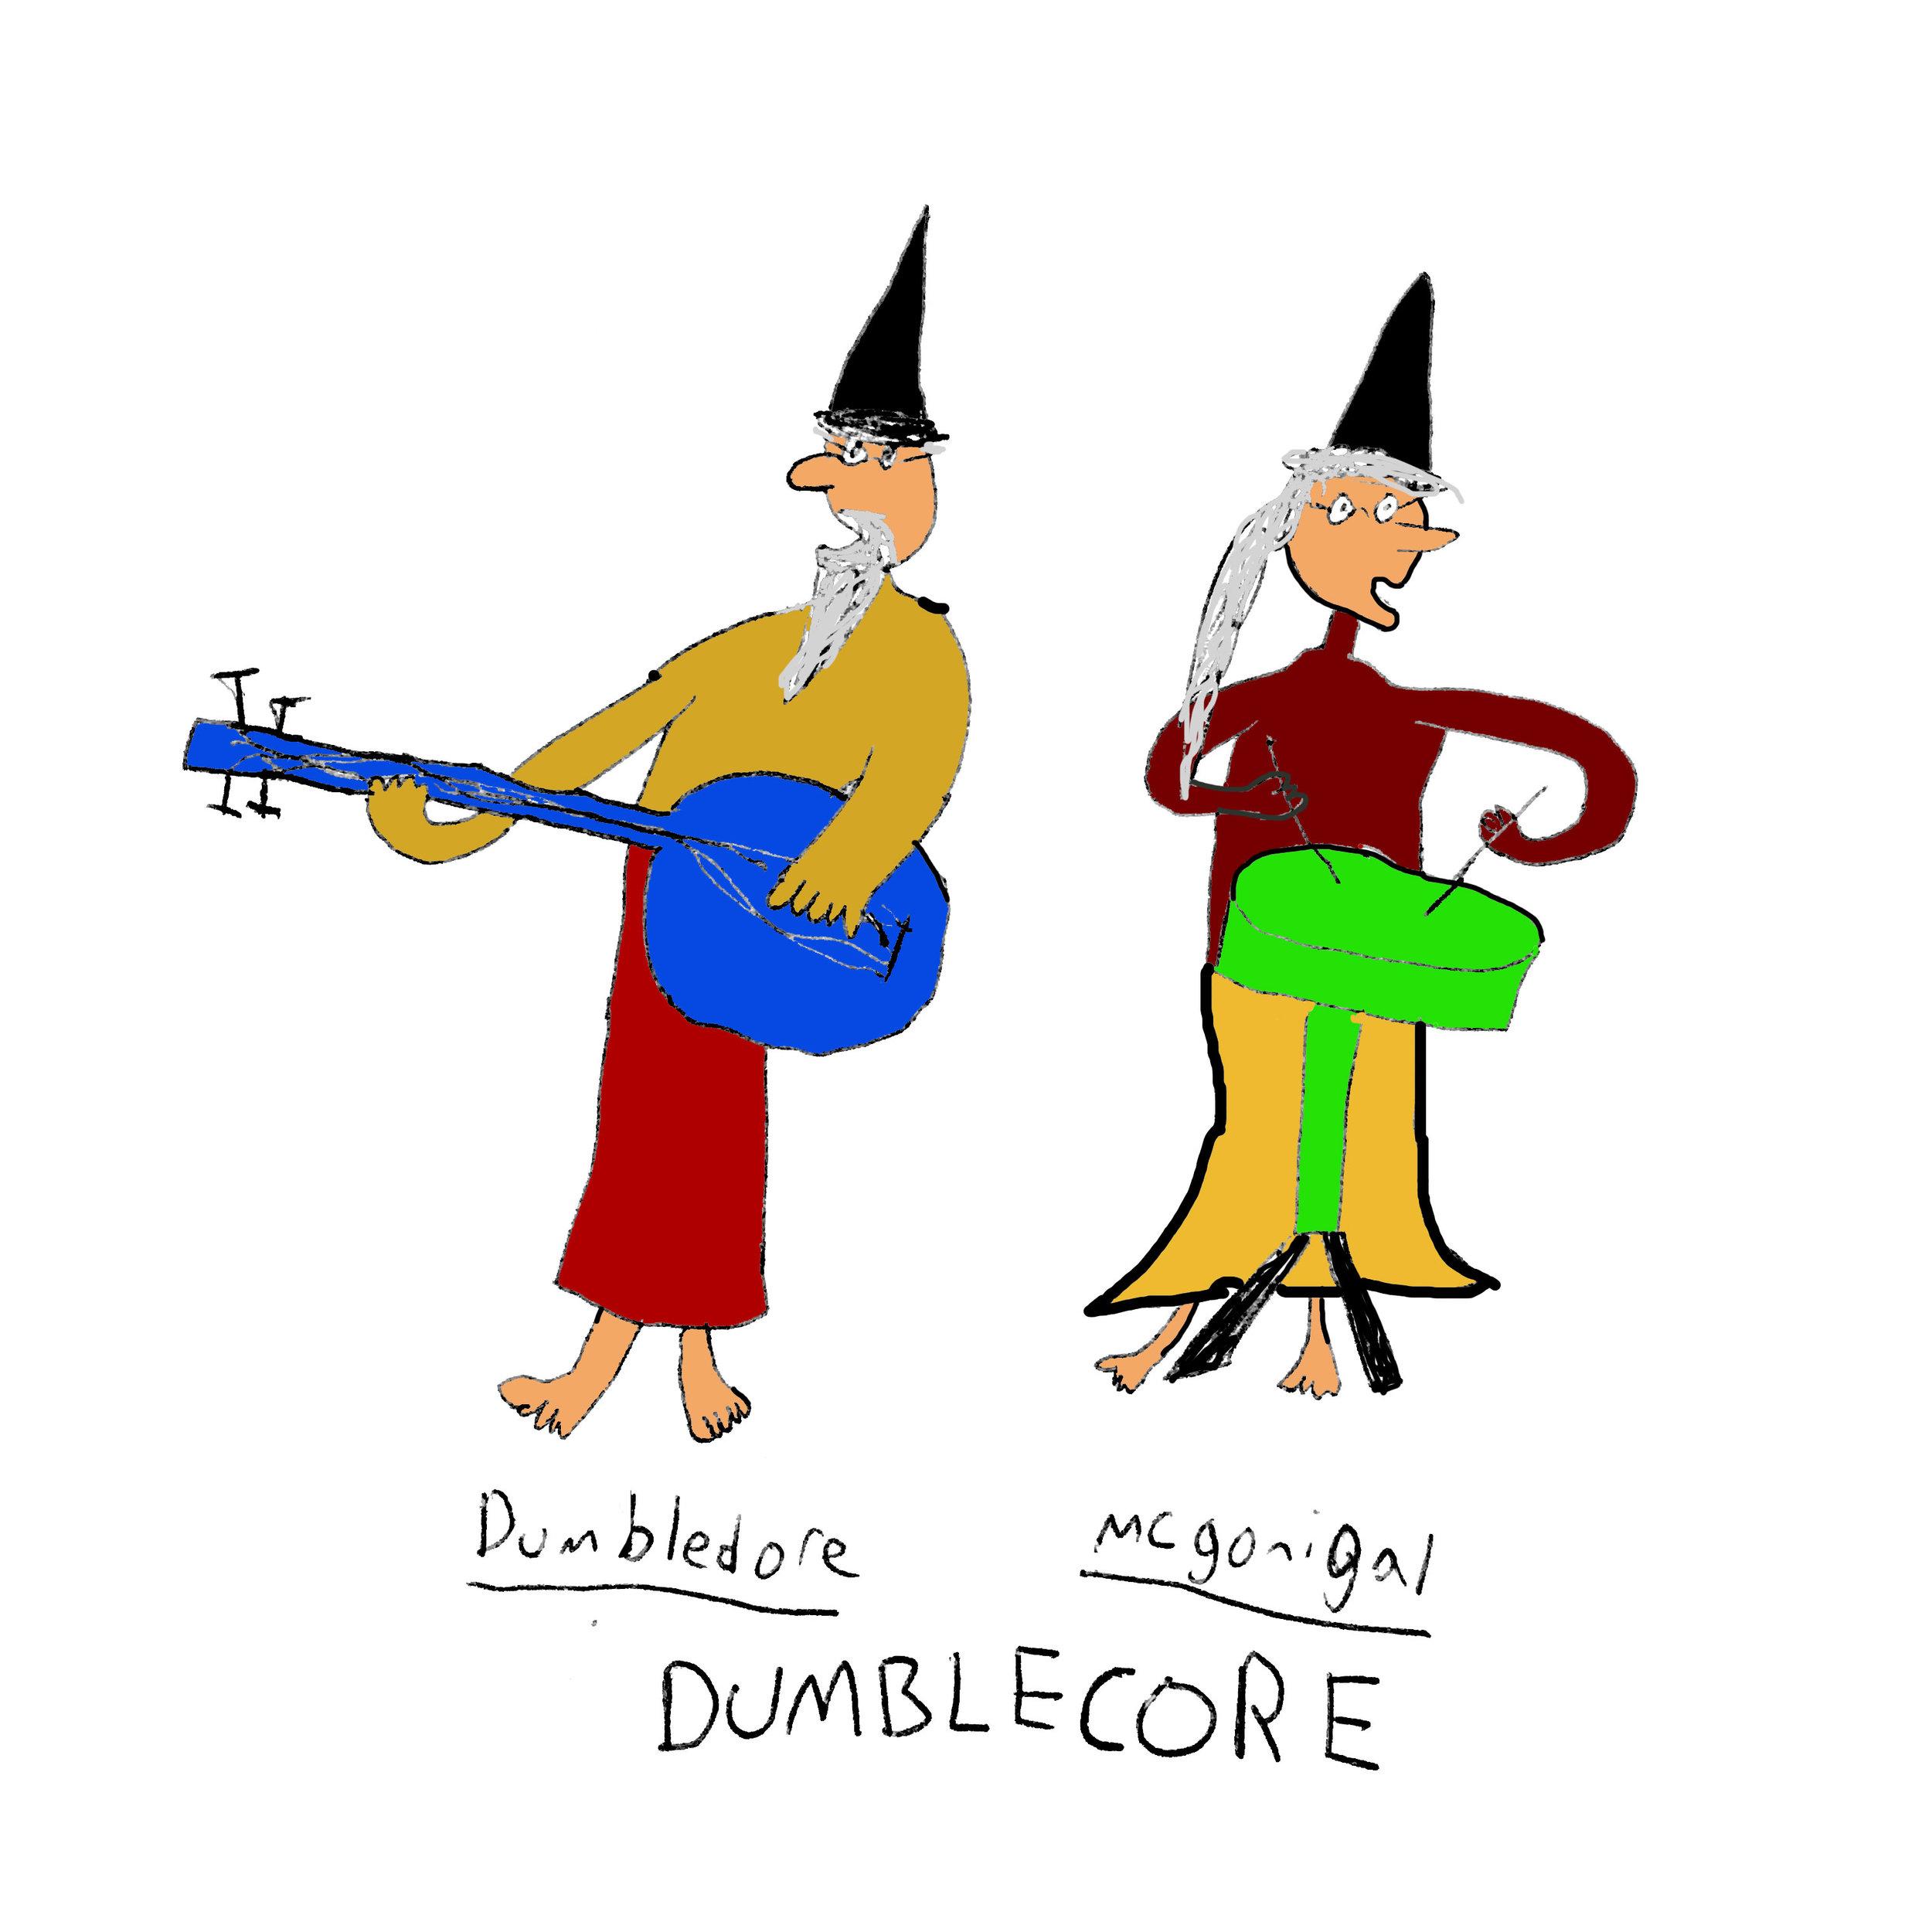 Dumblecore.jpg